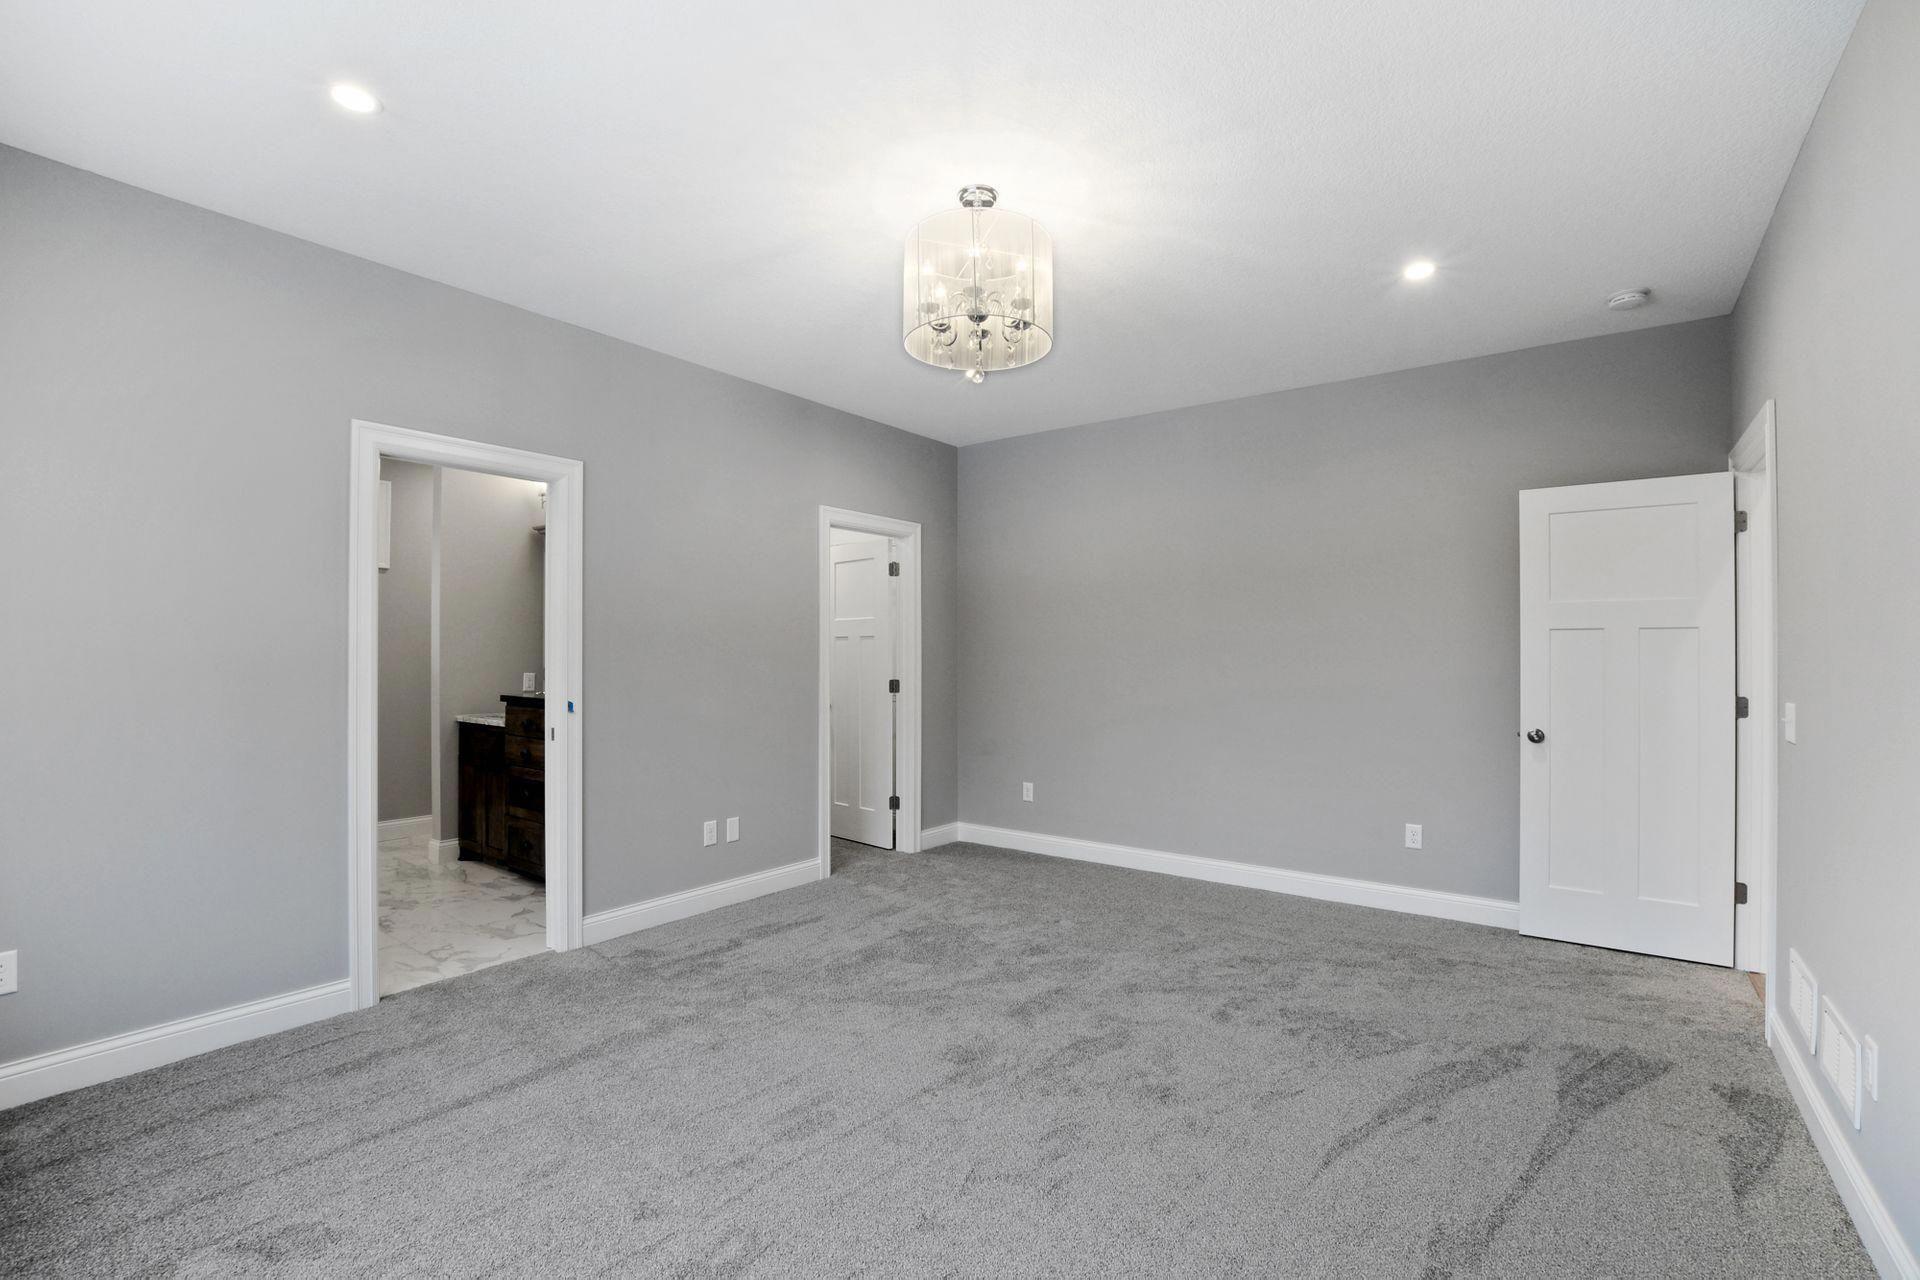 Kitchen Carpet Runners Washable Carpetrunnersforkitchens Info 6914846249 Grey Carpet Bedroom Grey Walls And Carpet Light Gray Carpet